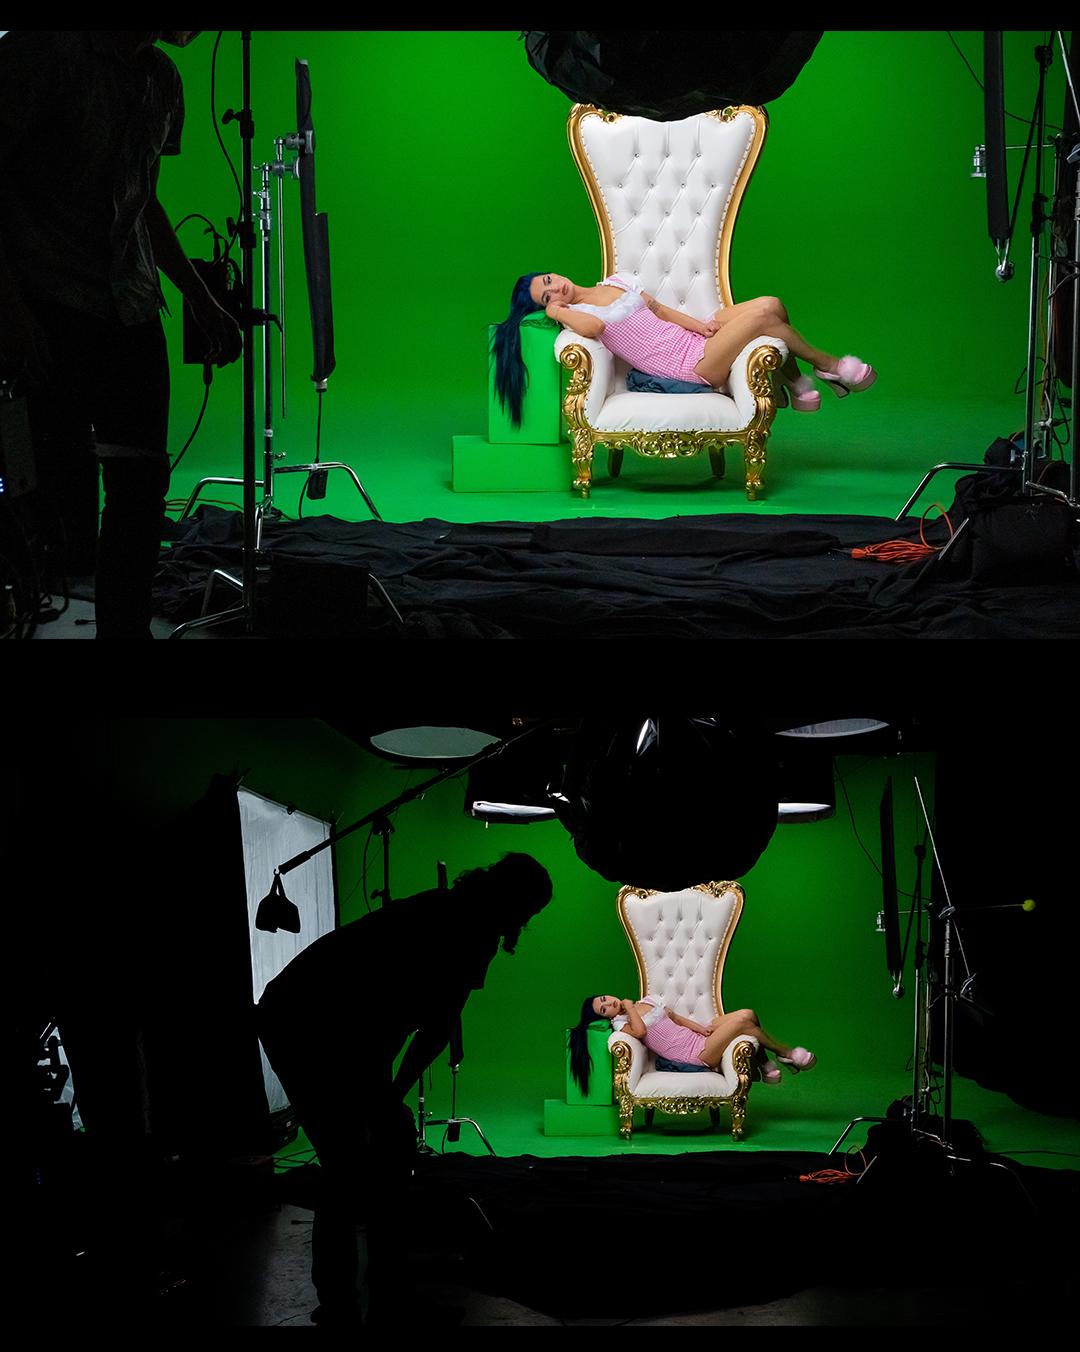 greenscreen music video shoot nyc